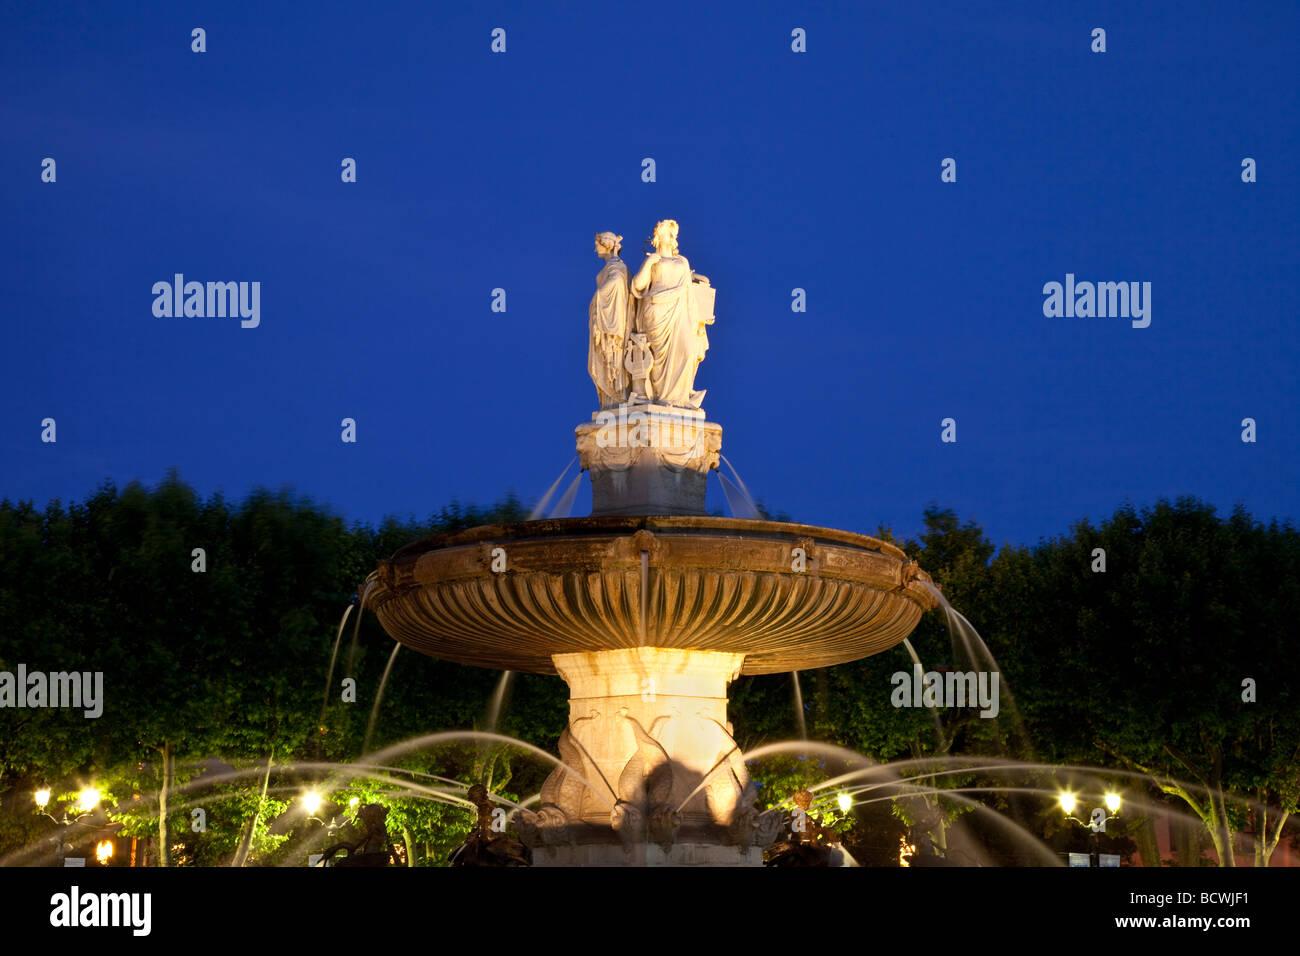 La Rotonde Fountain in Aix en-Provence, France - Stock Image